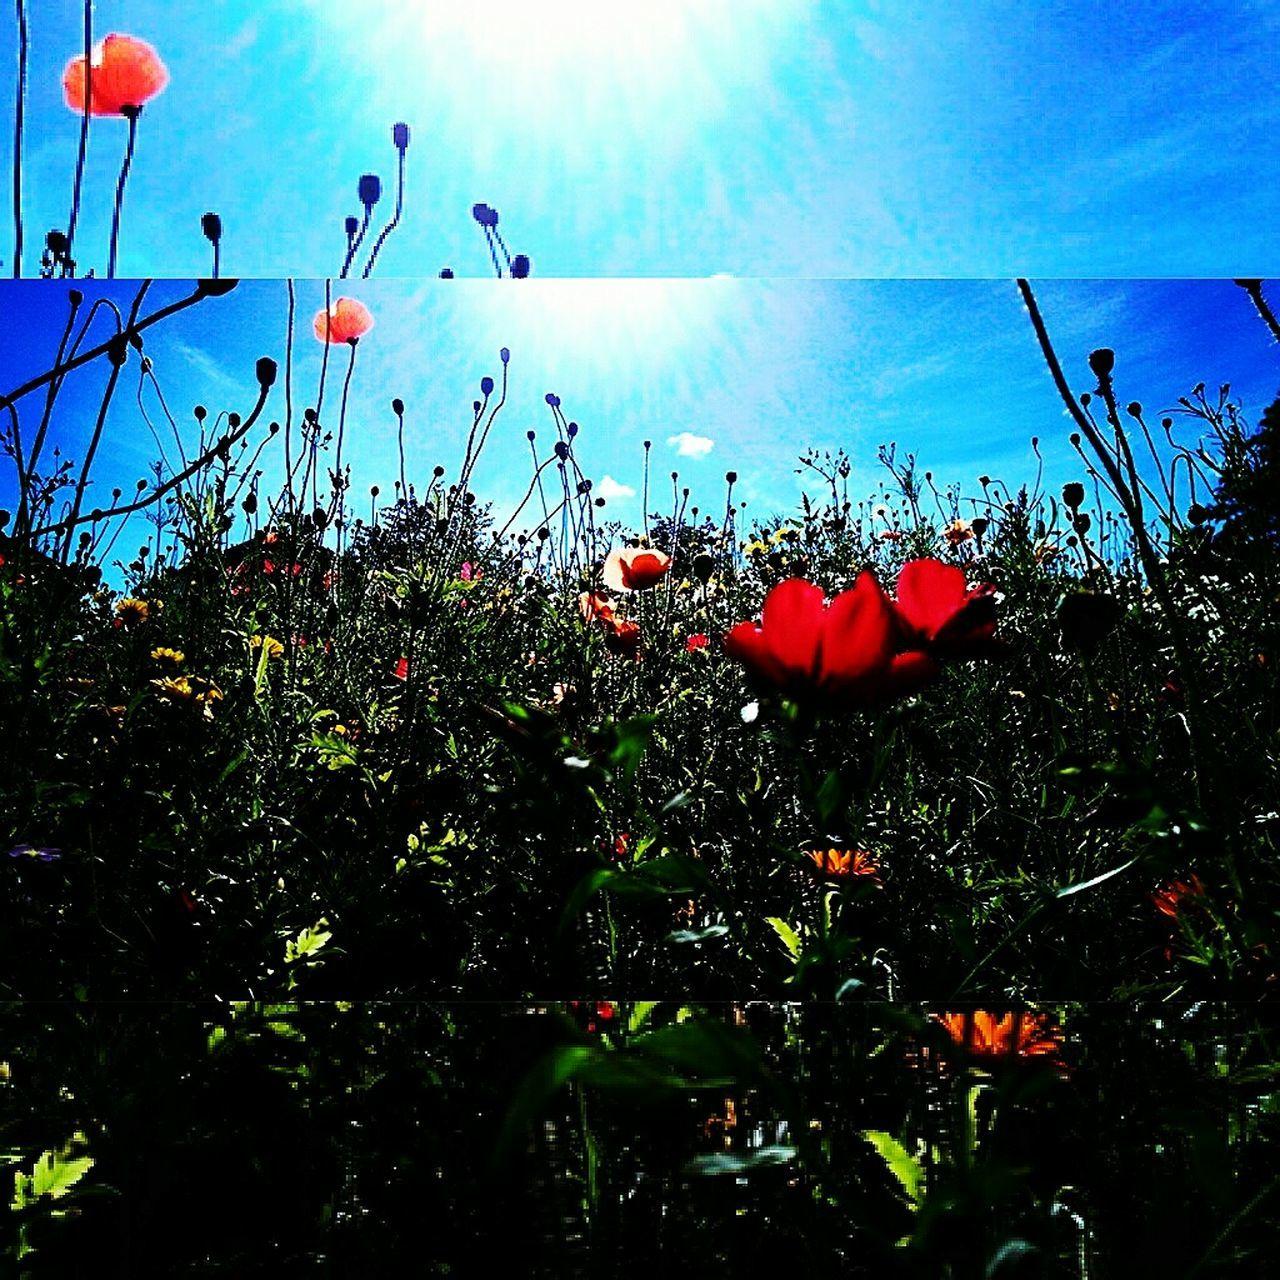 Sun worshipping☀🏵 Wild Flowers Sun Worshipping Poppies  Stems Sun Summer2016 Beauty In Nature Flower Photography Flowers, Nature And Beauty Beautiful Wildflowers Blue Sky Nature Freshness Horfield Bristol Uk